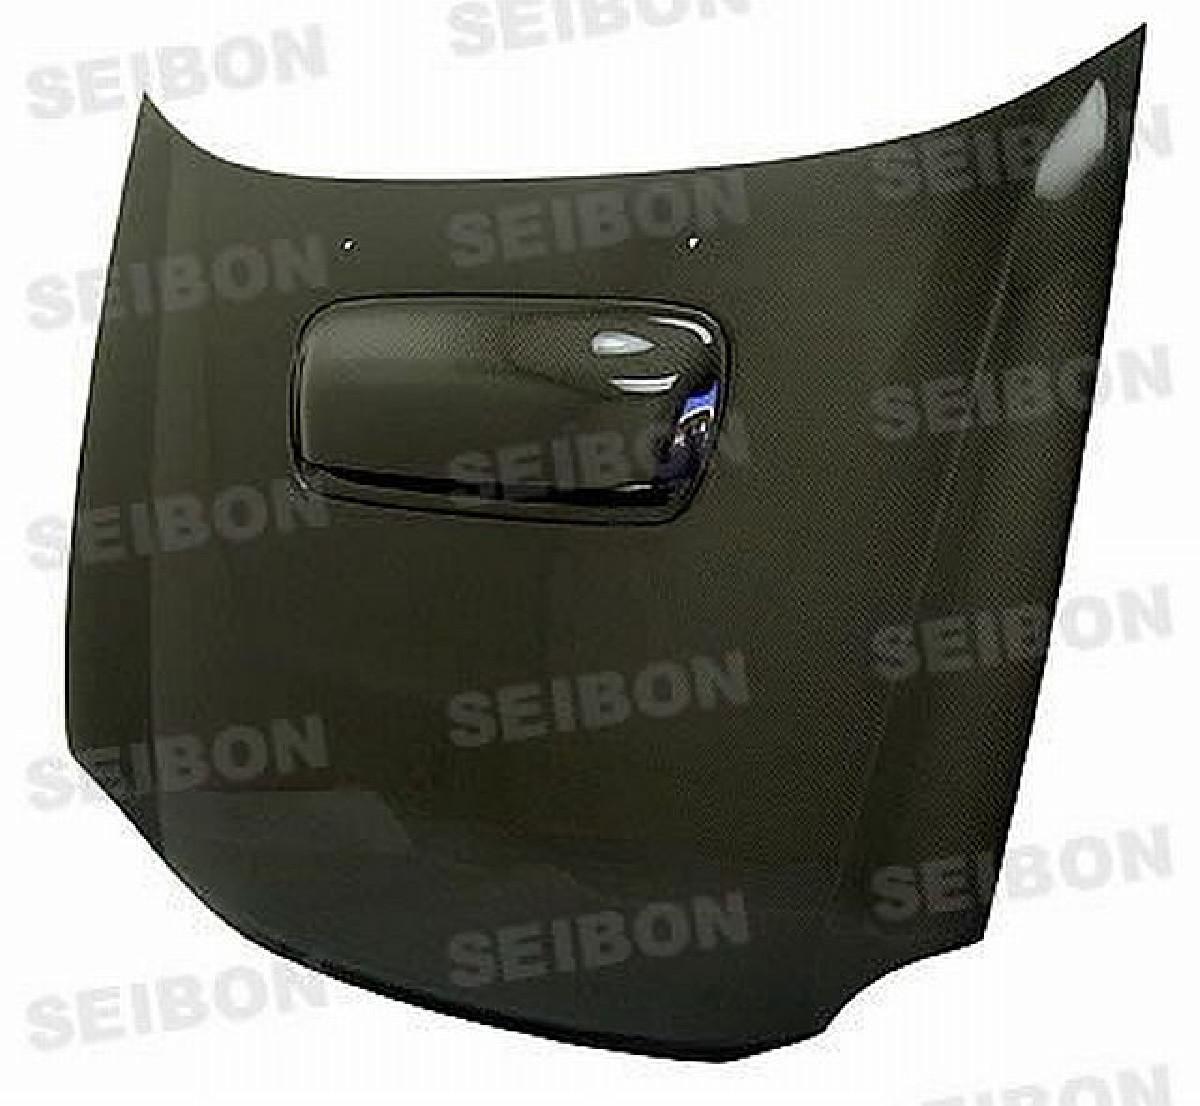 Seibon OEM Carbon Motorhaube Subaru Impreza WRX GDA/B 00-03